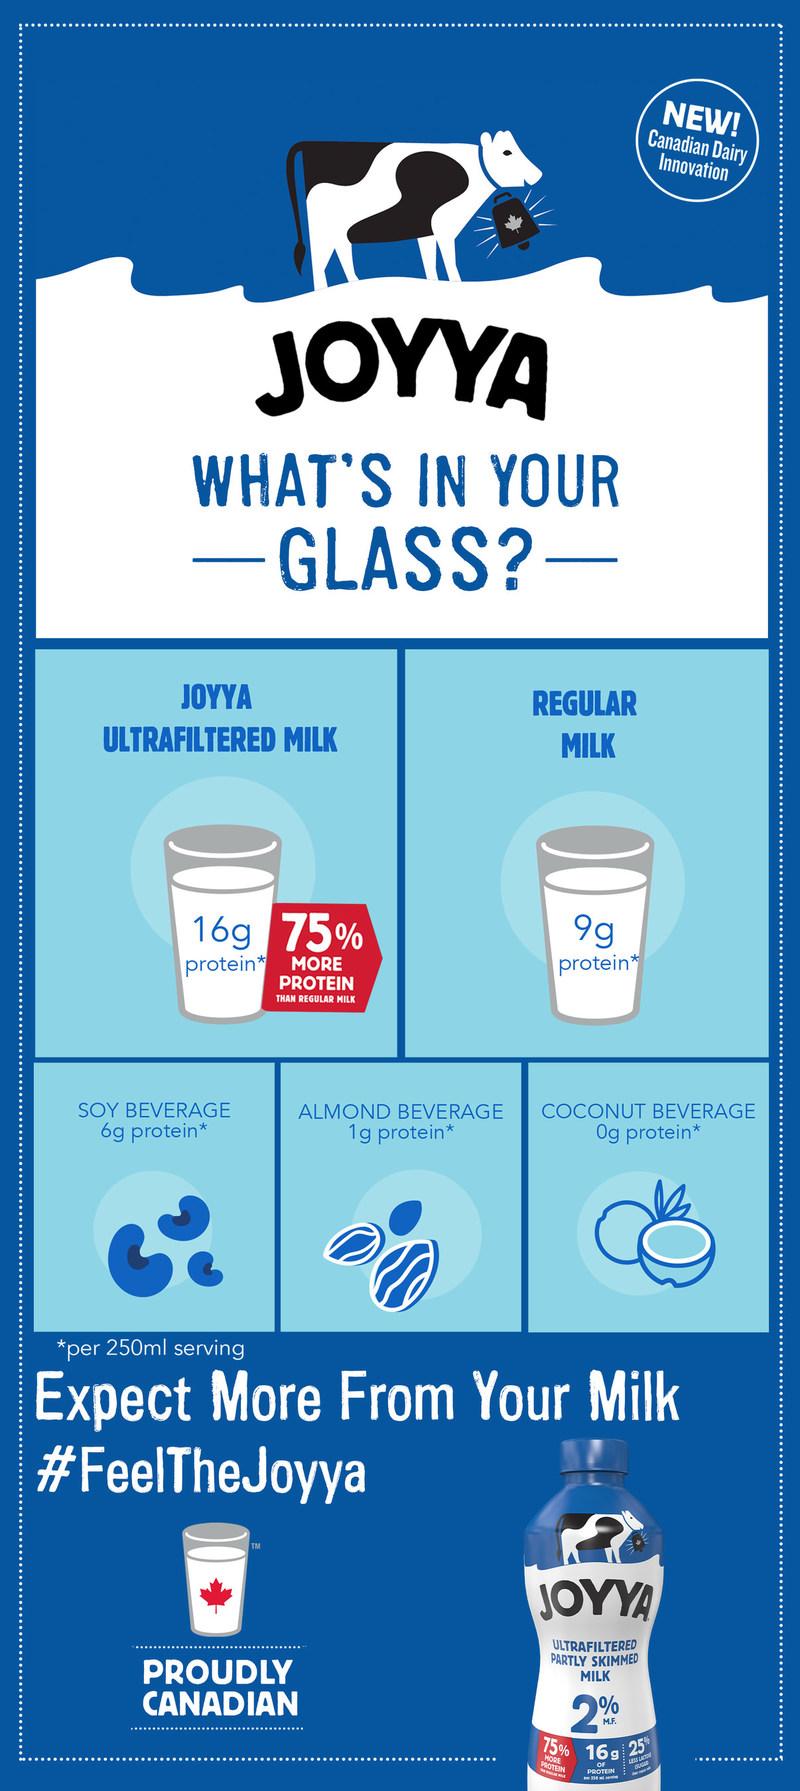 JOYYA – 100% Canadian Ultrafiltered Milk Launches in Canada (CNW Group/Saputo Inc.)